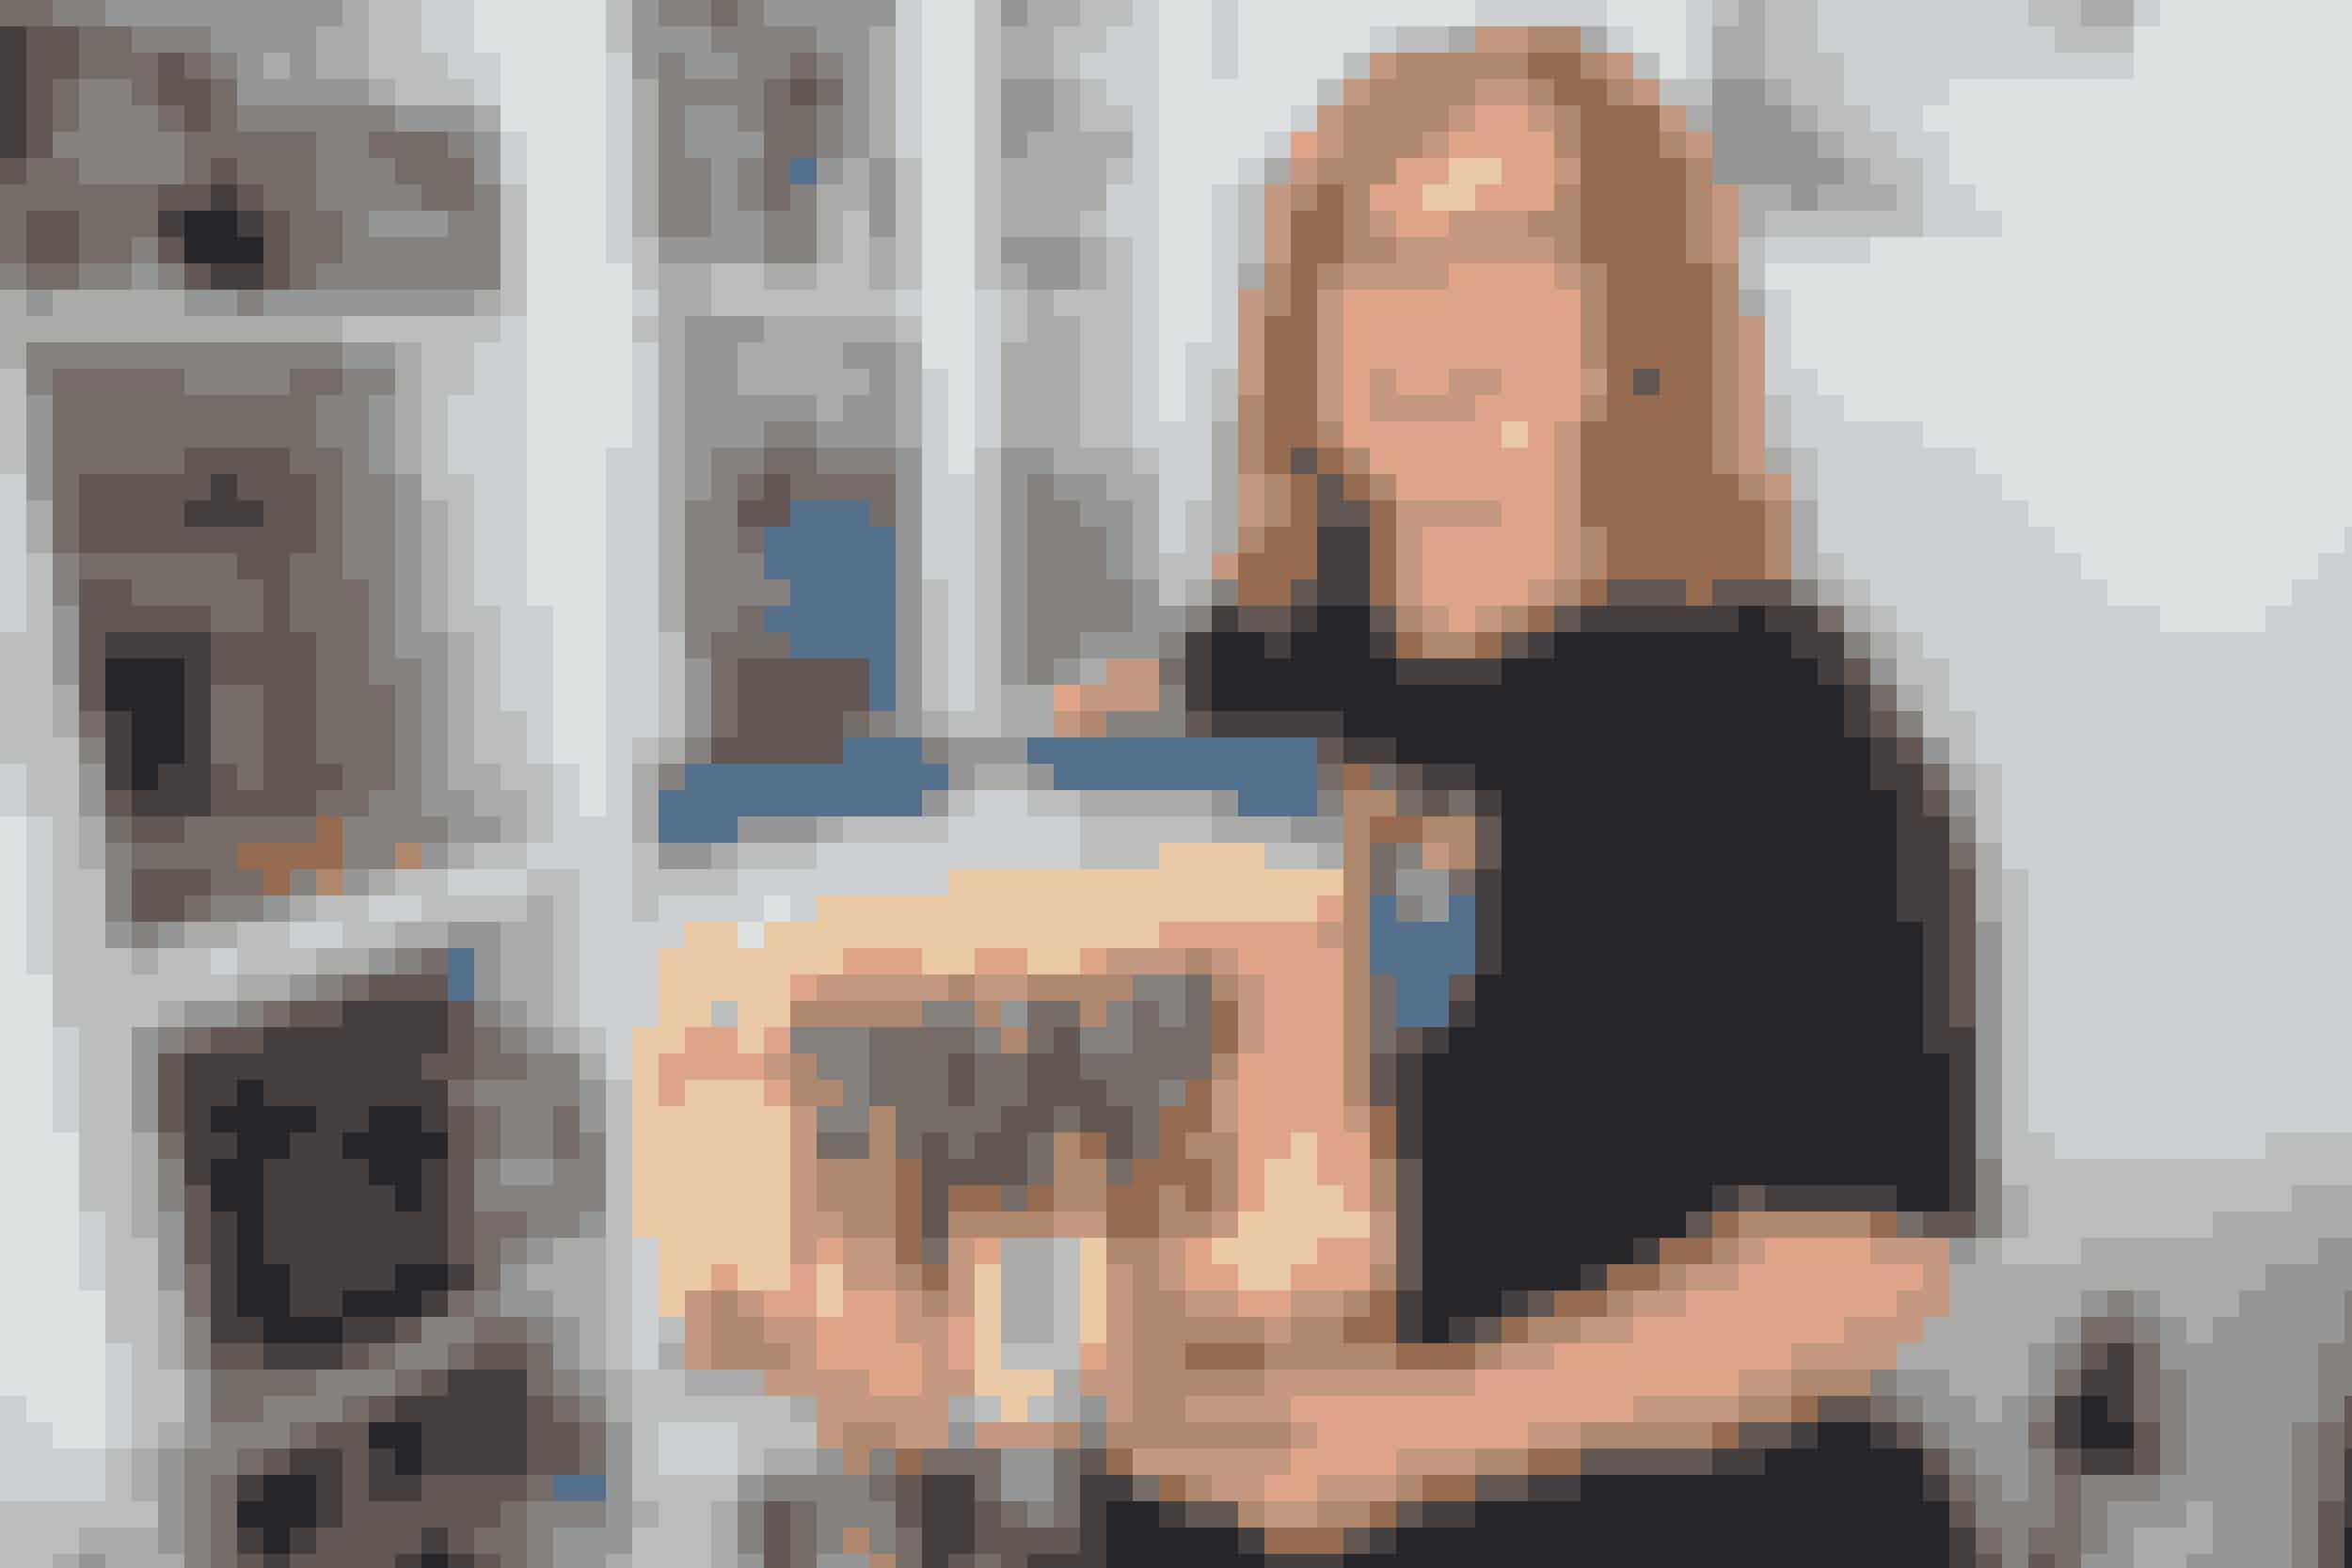 "Jonas og hans mor, Anette, medvirker i den nye biograffilm ""Kandis for livet"", som er en dokumentar om en gruppe dedikerede Kandis-fans, der gennem deres unikke forhold til dansktopbandet Kandis og forsangeren Johnny Hansen finder trøst og mening med livet. Filmen har premiere i biografer landet over den 23. september."